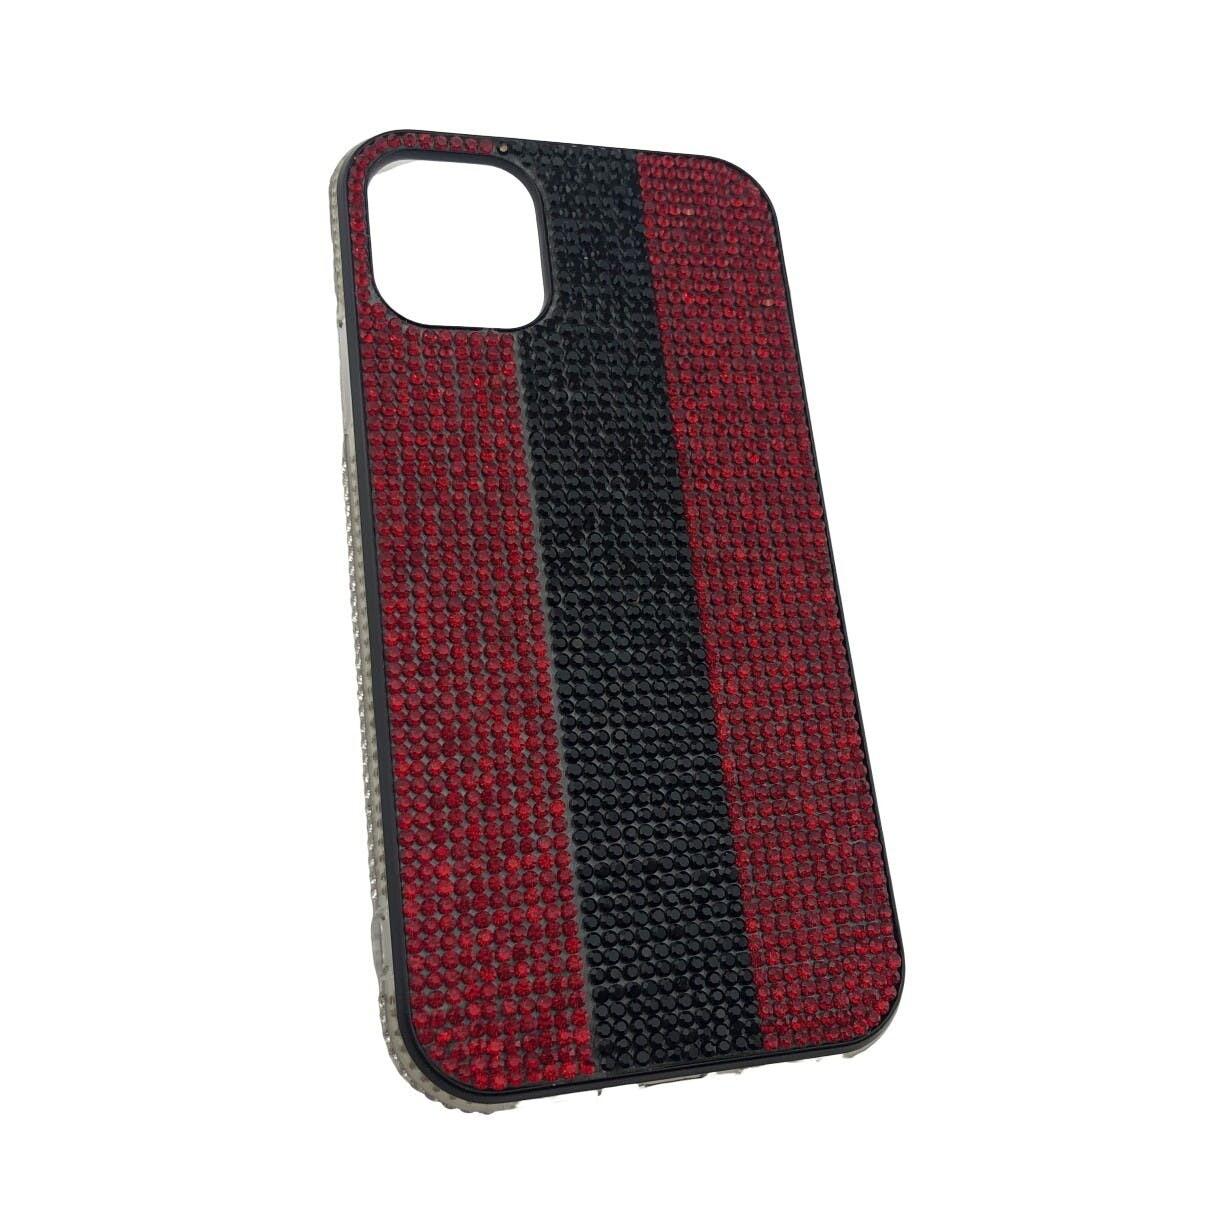 Diamond Bling Case - iPhone 11 Pro Max